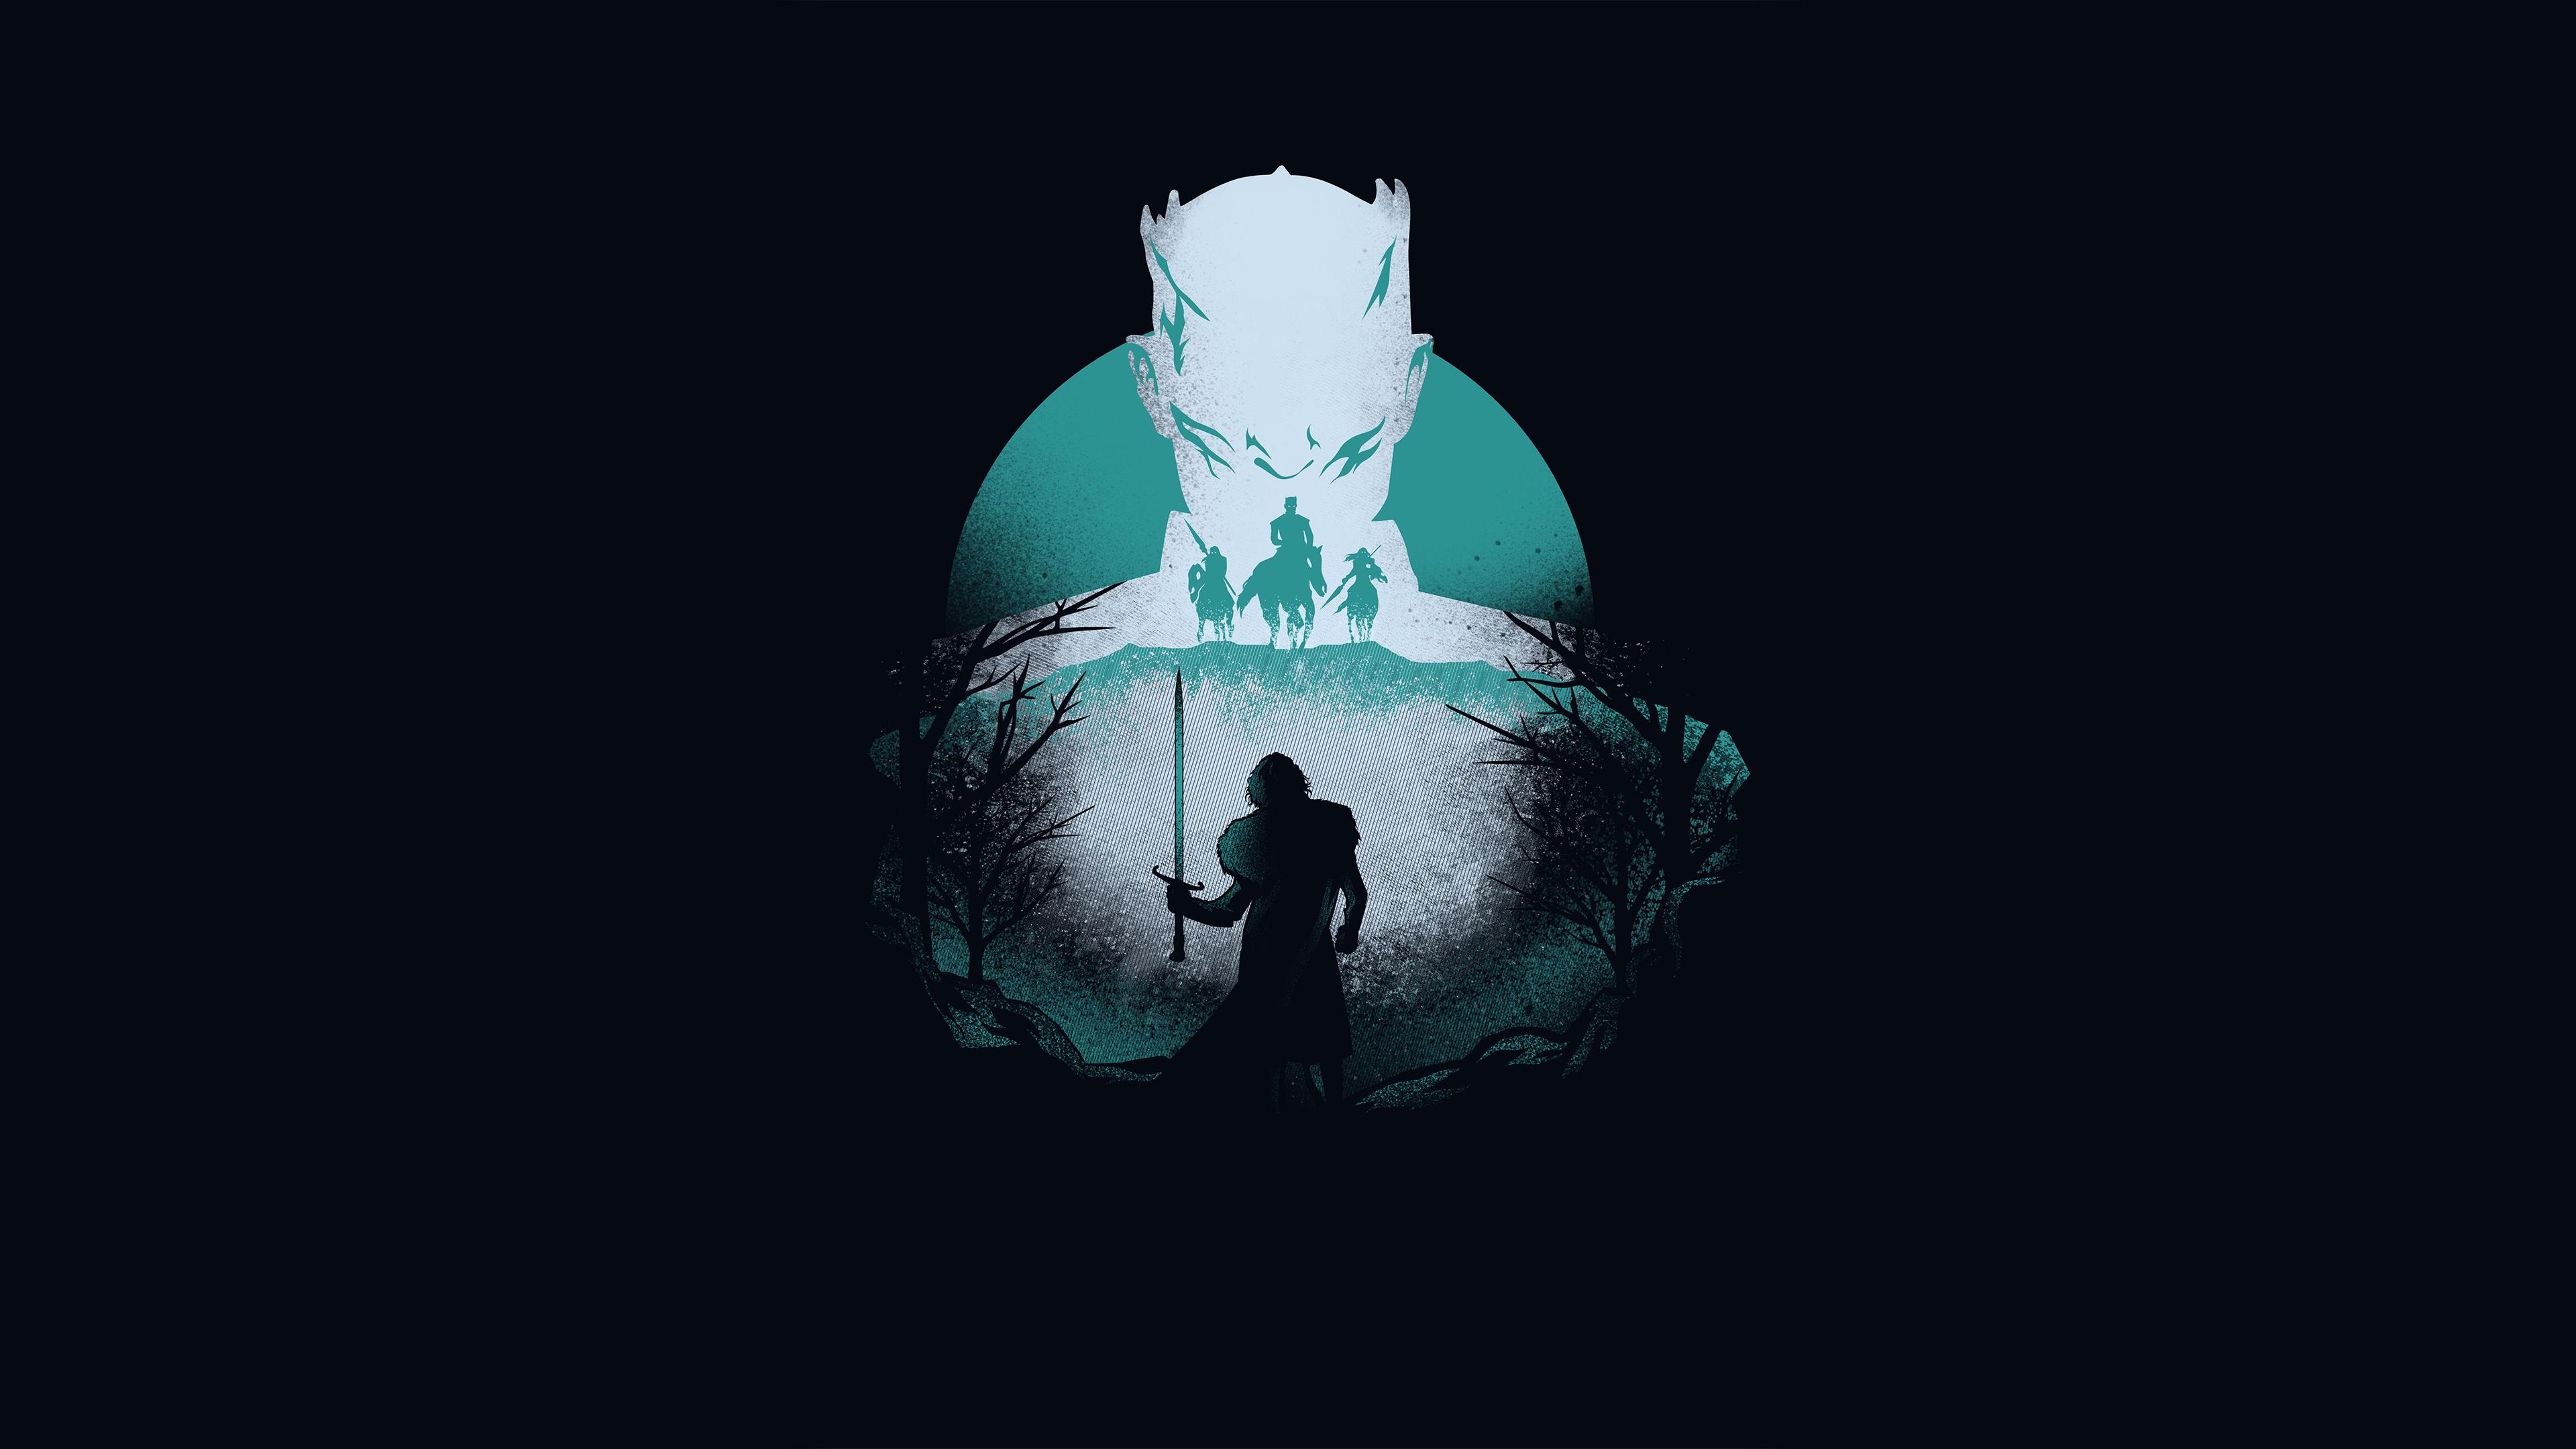 Night King, Jon Snow, Minimalist, Game of Thrones, 4K, #52 ...